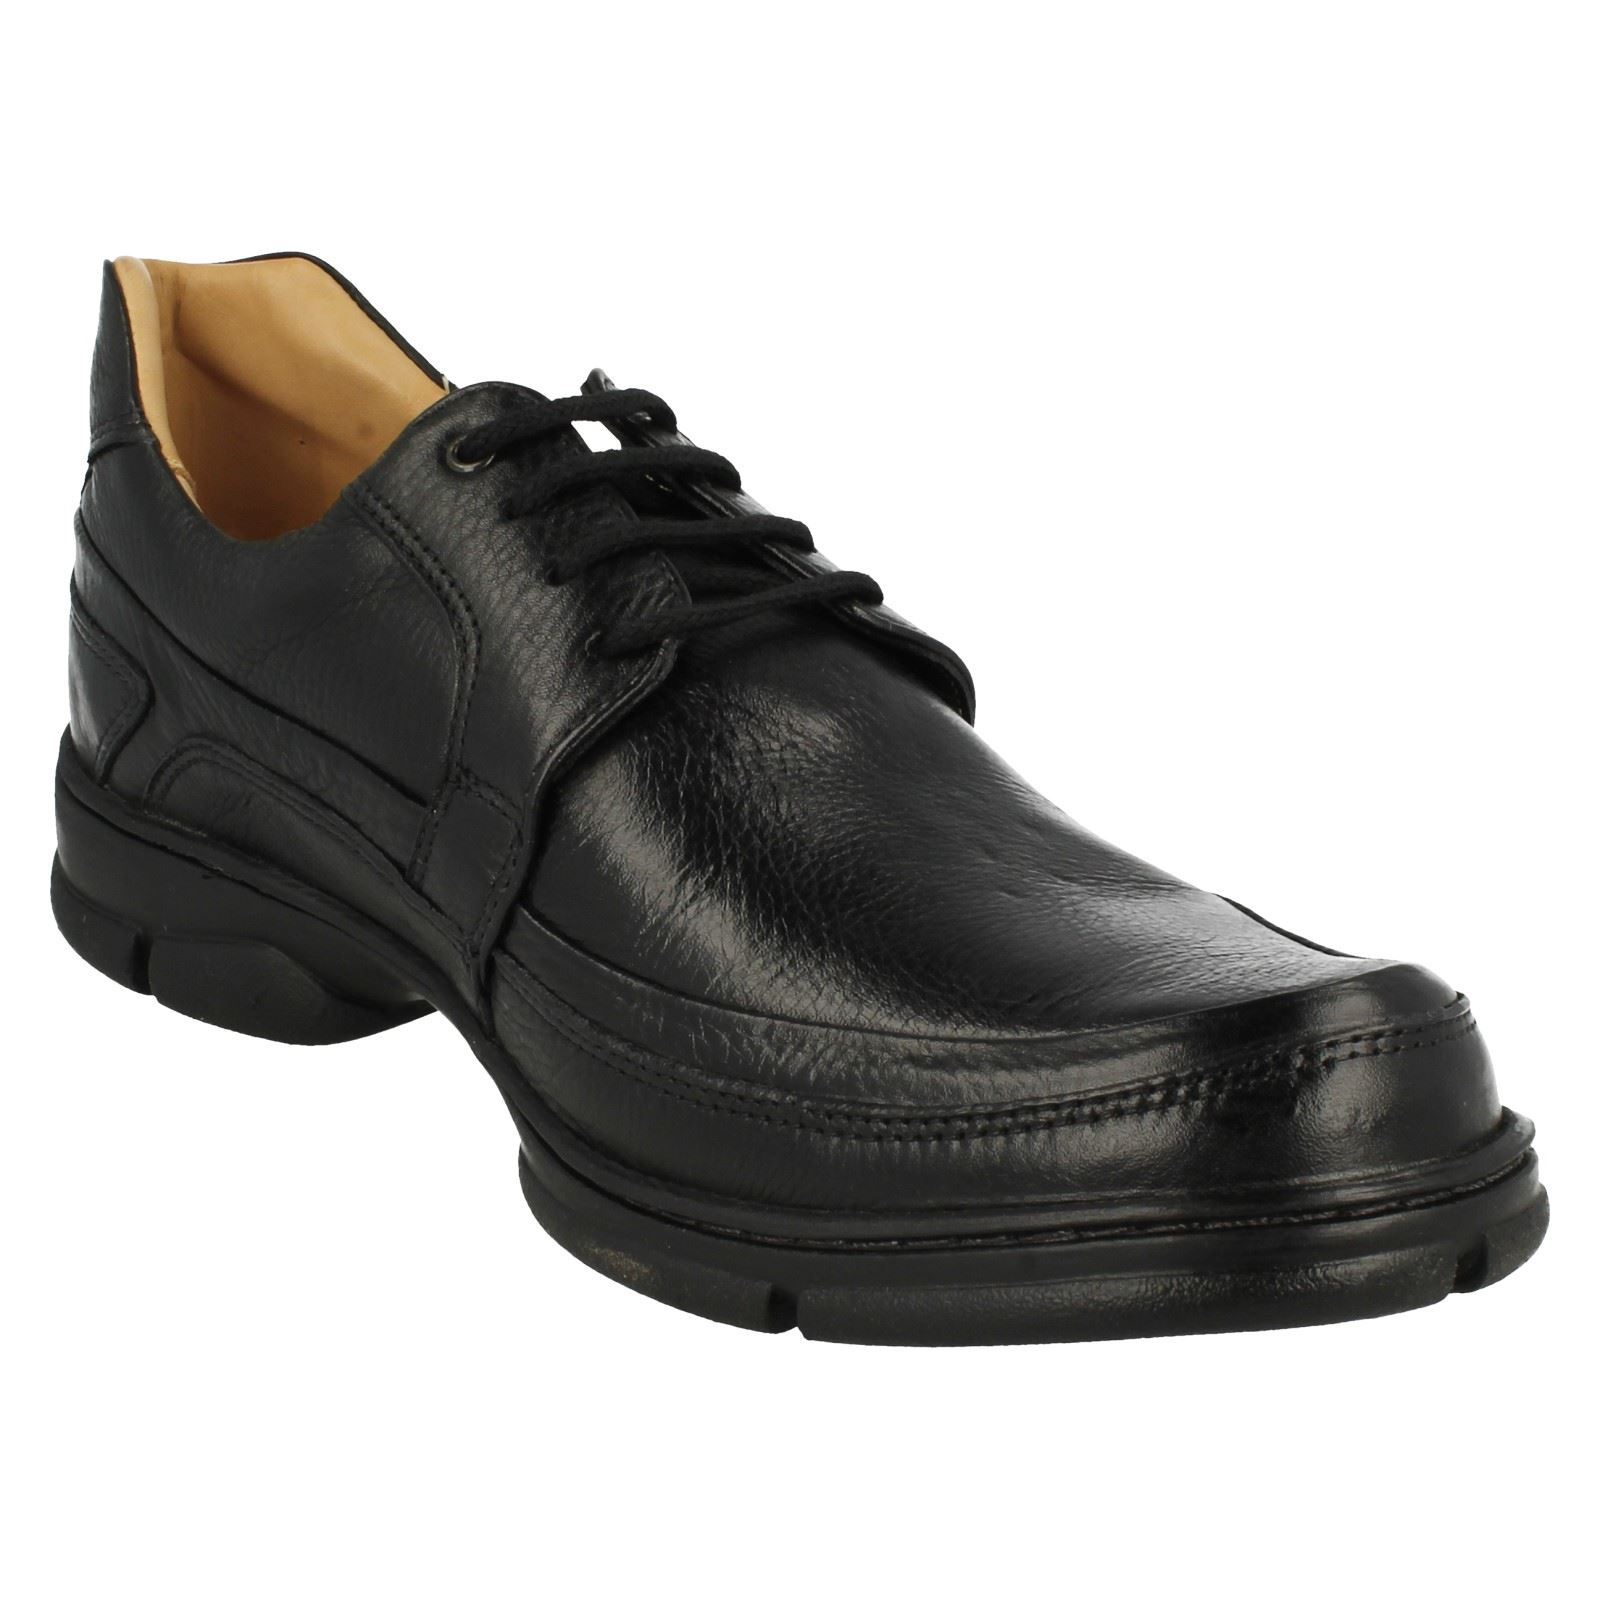 Mens Anatomic Smart Smart Smart Lace Up Shoes Colinas 5e0b51